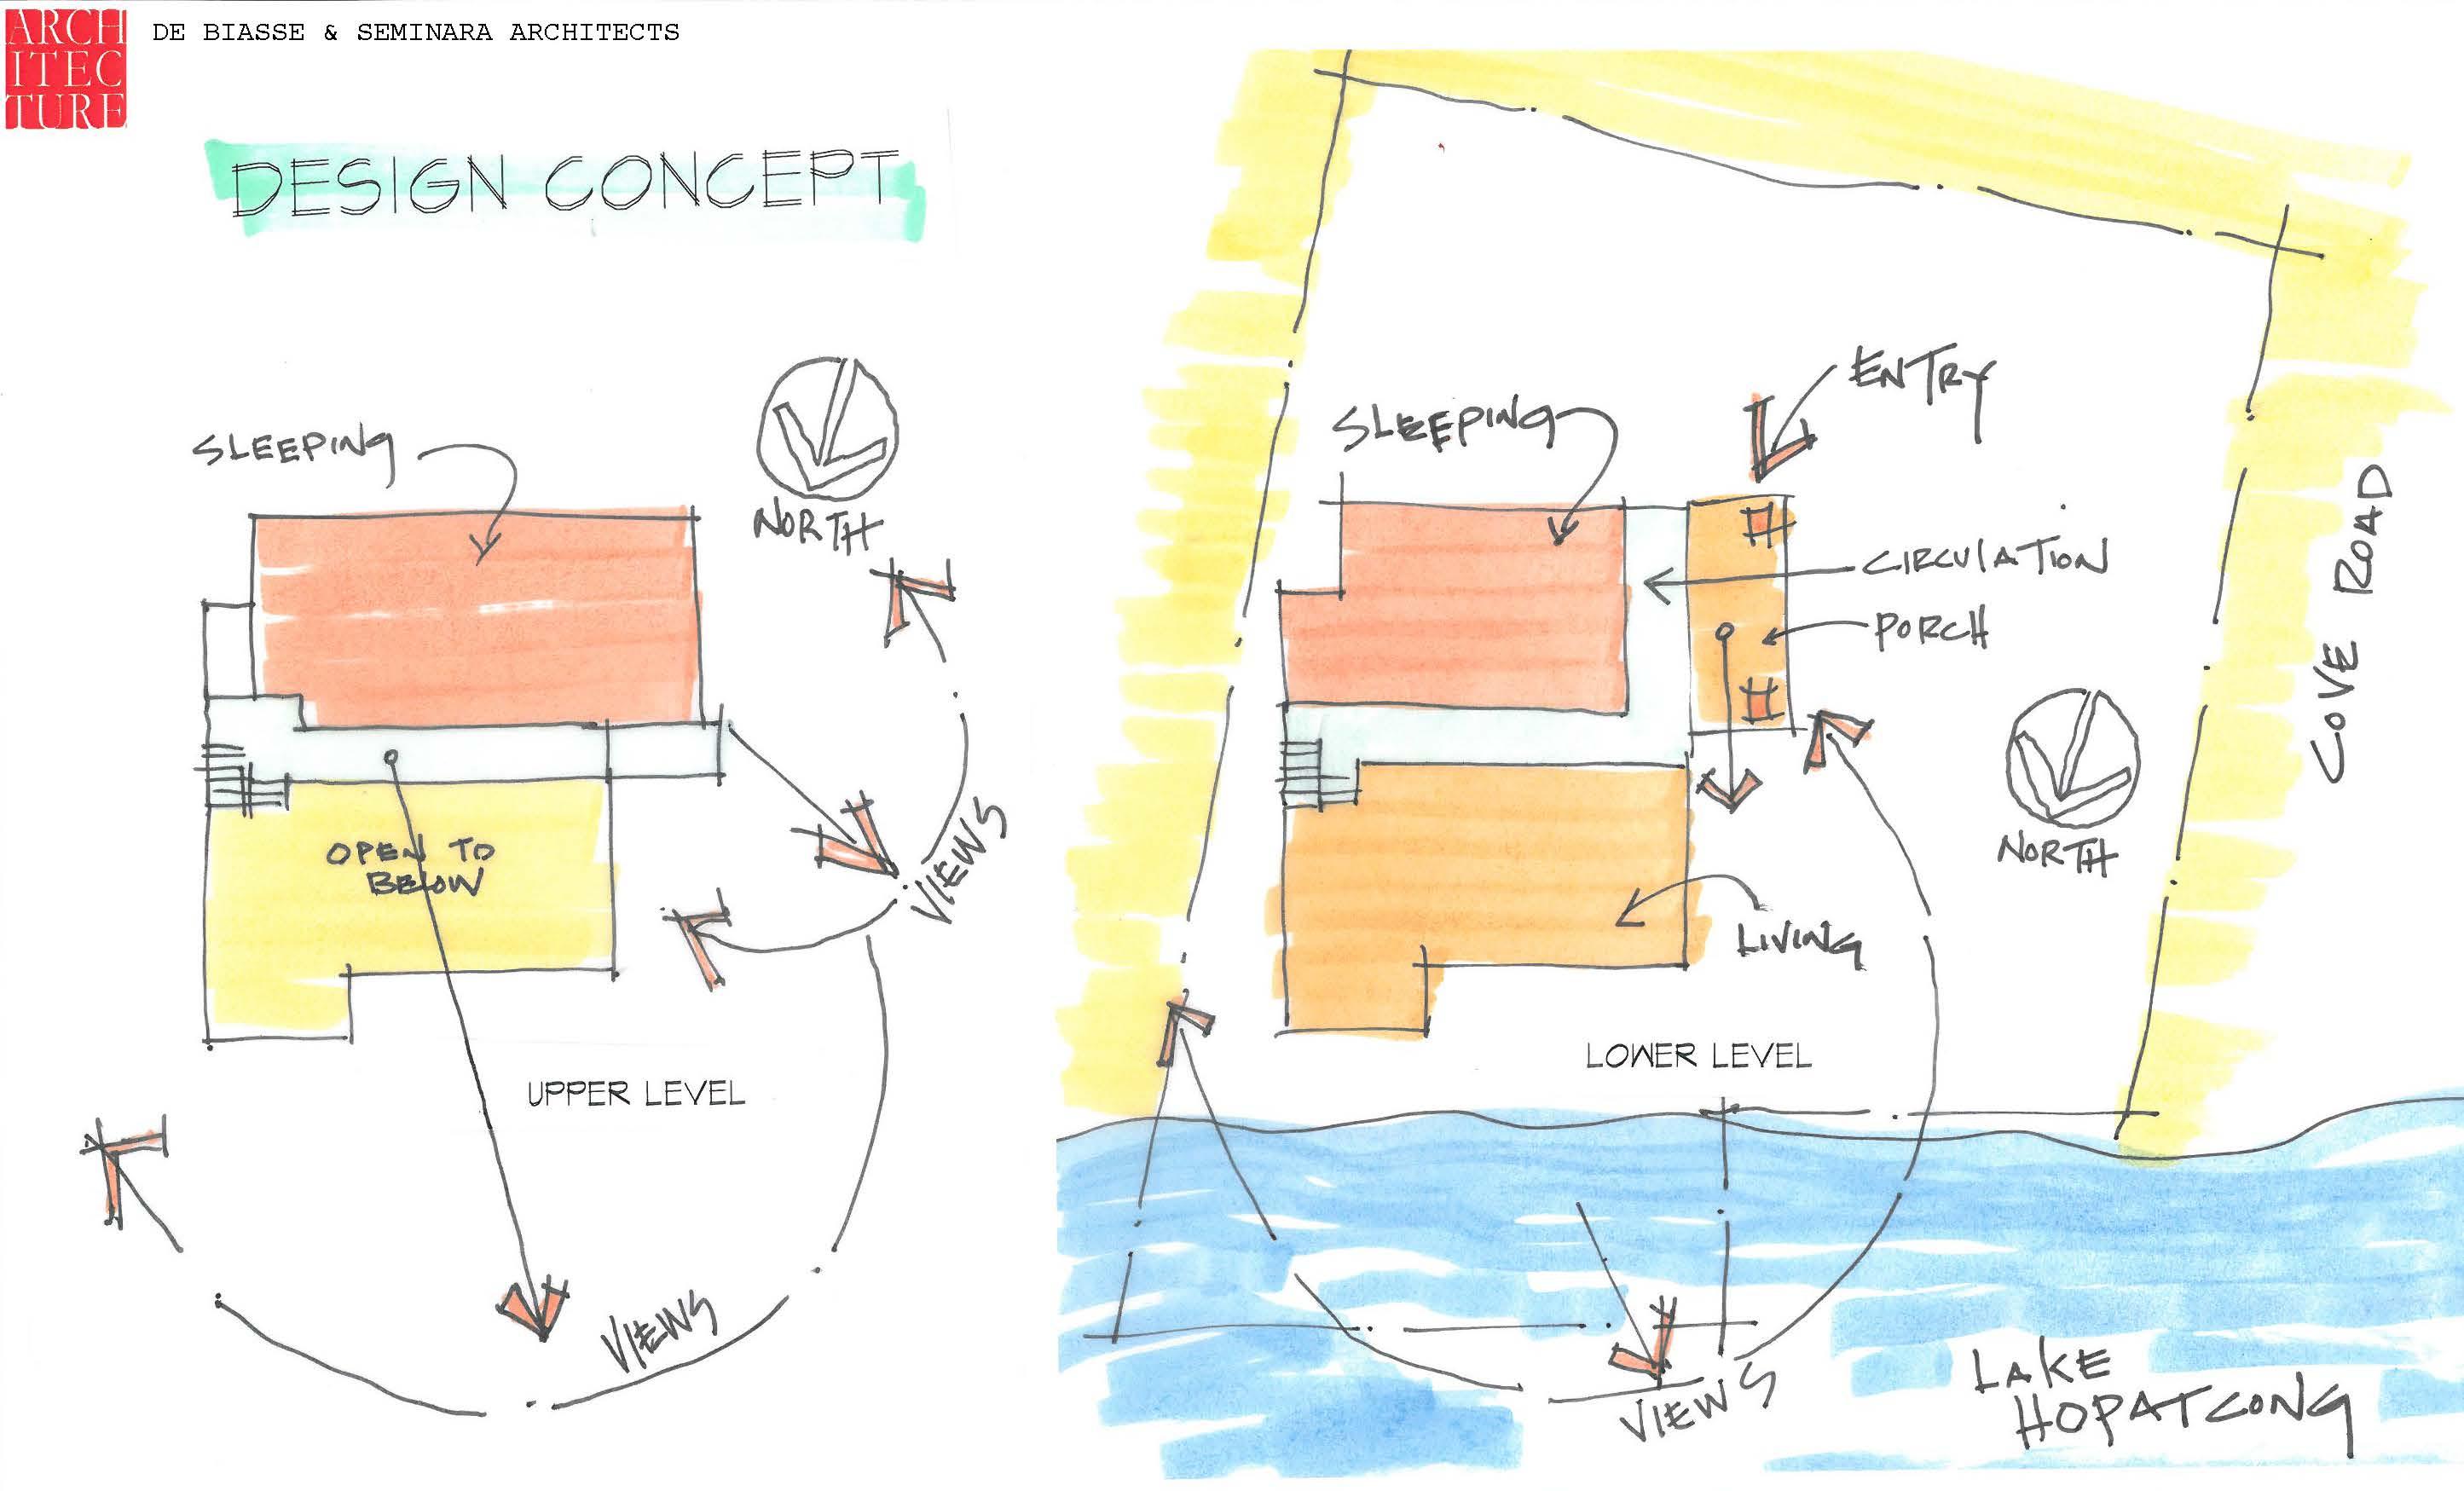 Home Renovation Project on Lake Hopatcong | De Biasse & Seminara ...